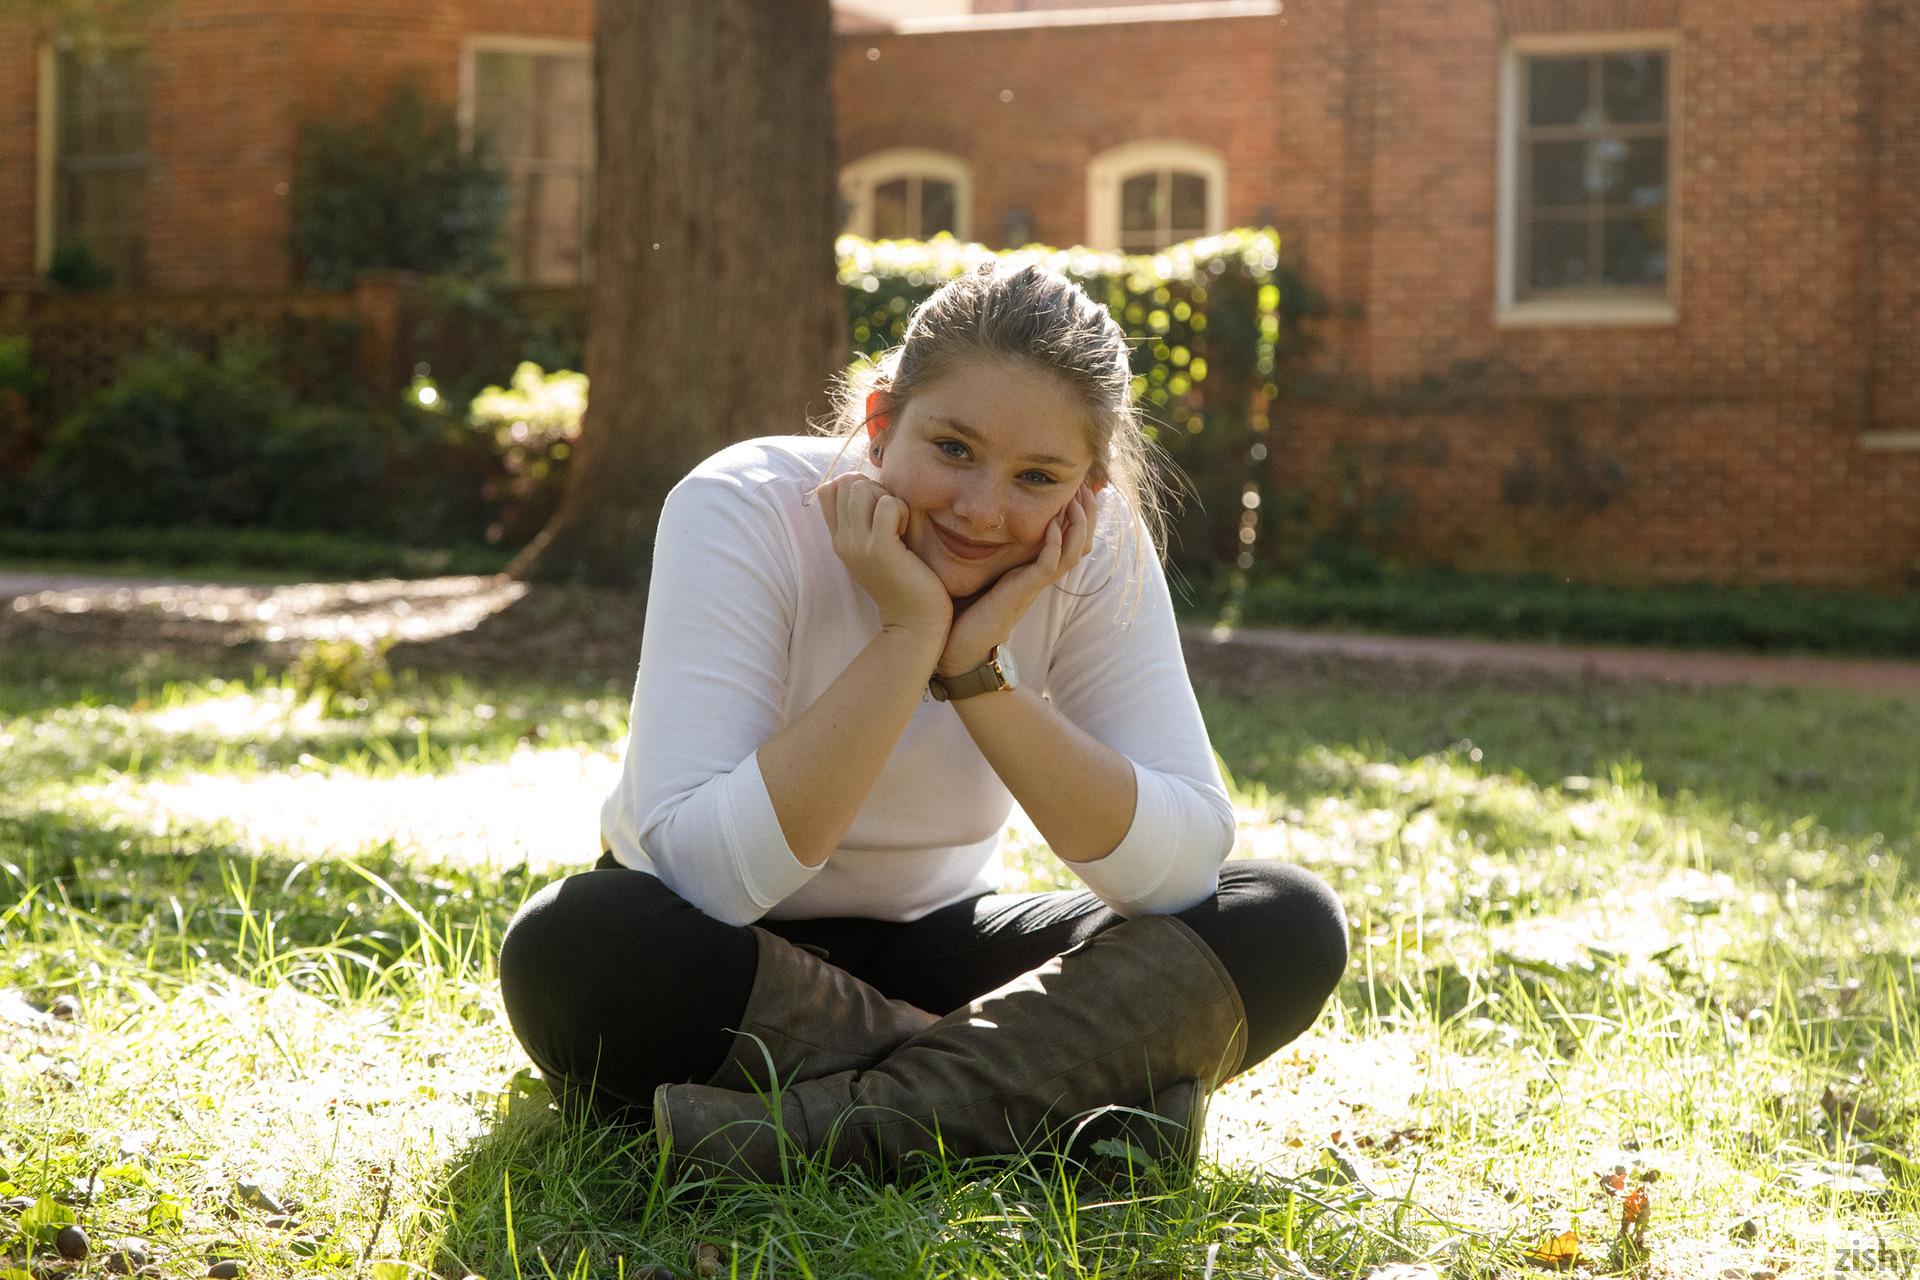 Fawn Richfield At Chapel Hill Zishy (25)